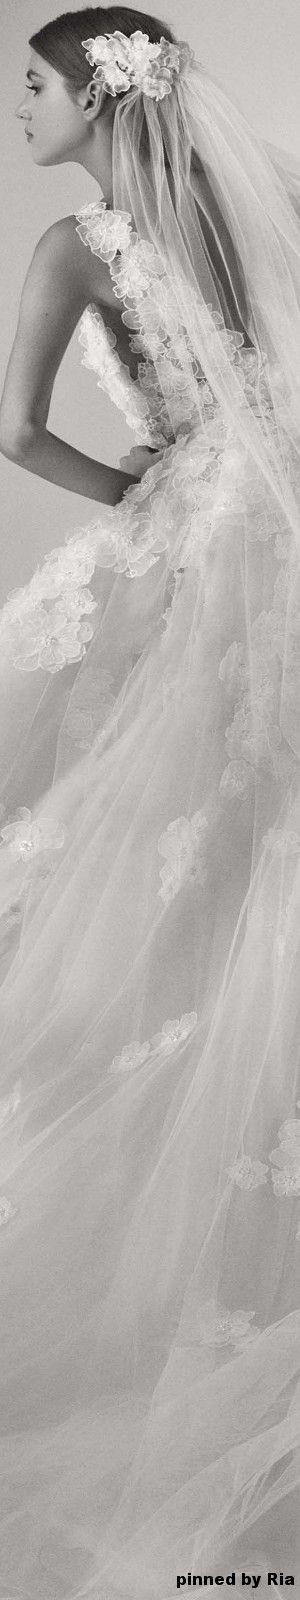 Elie Saab Bridal Fall 2017 l Ria